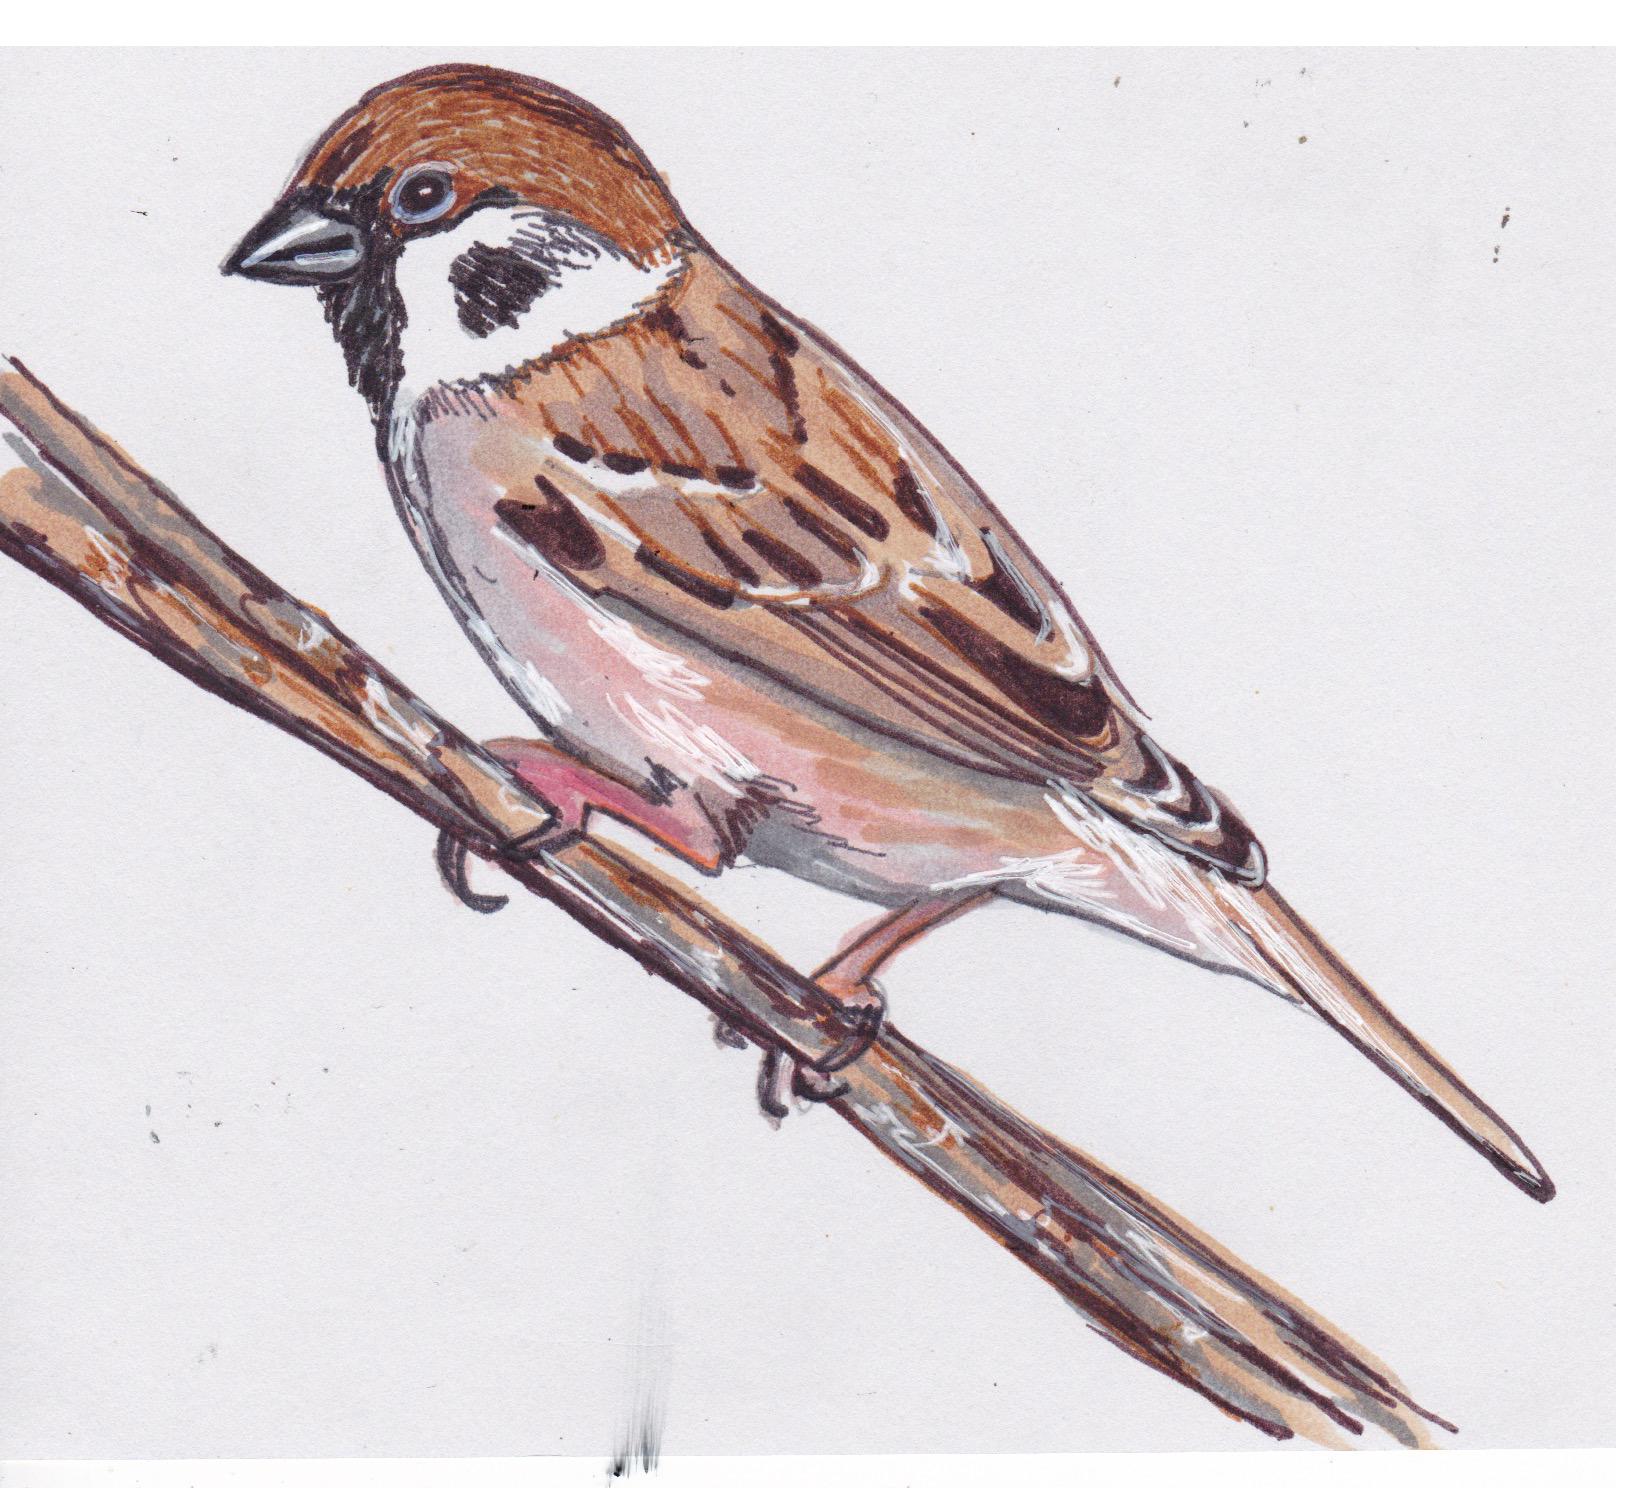 Falcon clipart sparrow. Illustrations bird scout